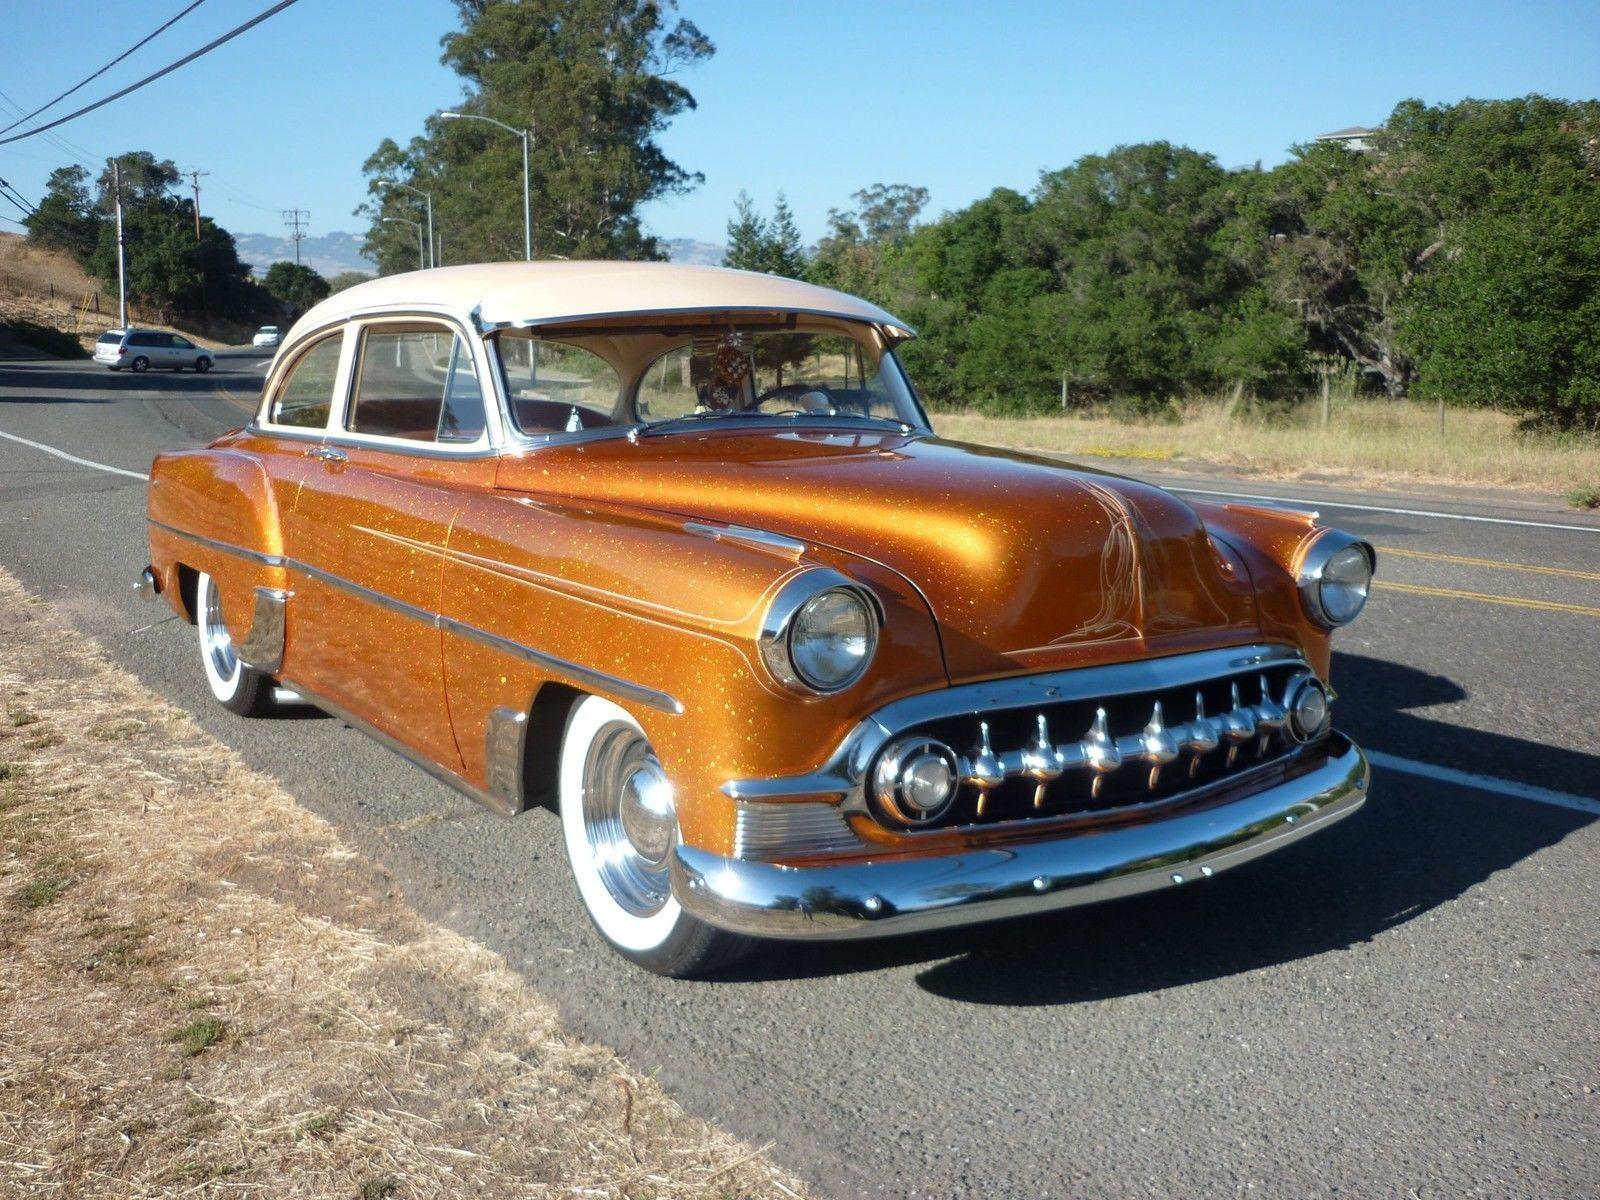 1956 chevrolet belair mjc classic cars pristine - Chevrolet Bel Air 150 210 Custom 1953 Chevrolet 210 Mild Custom Belair Bomp